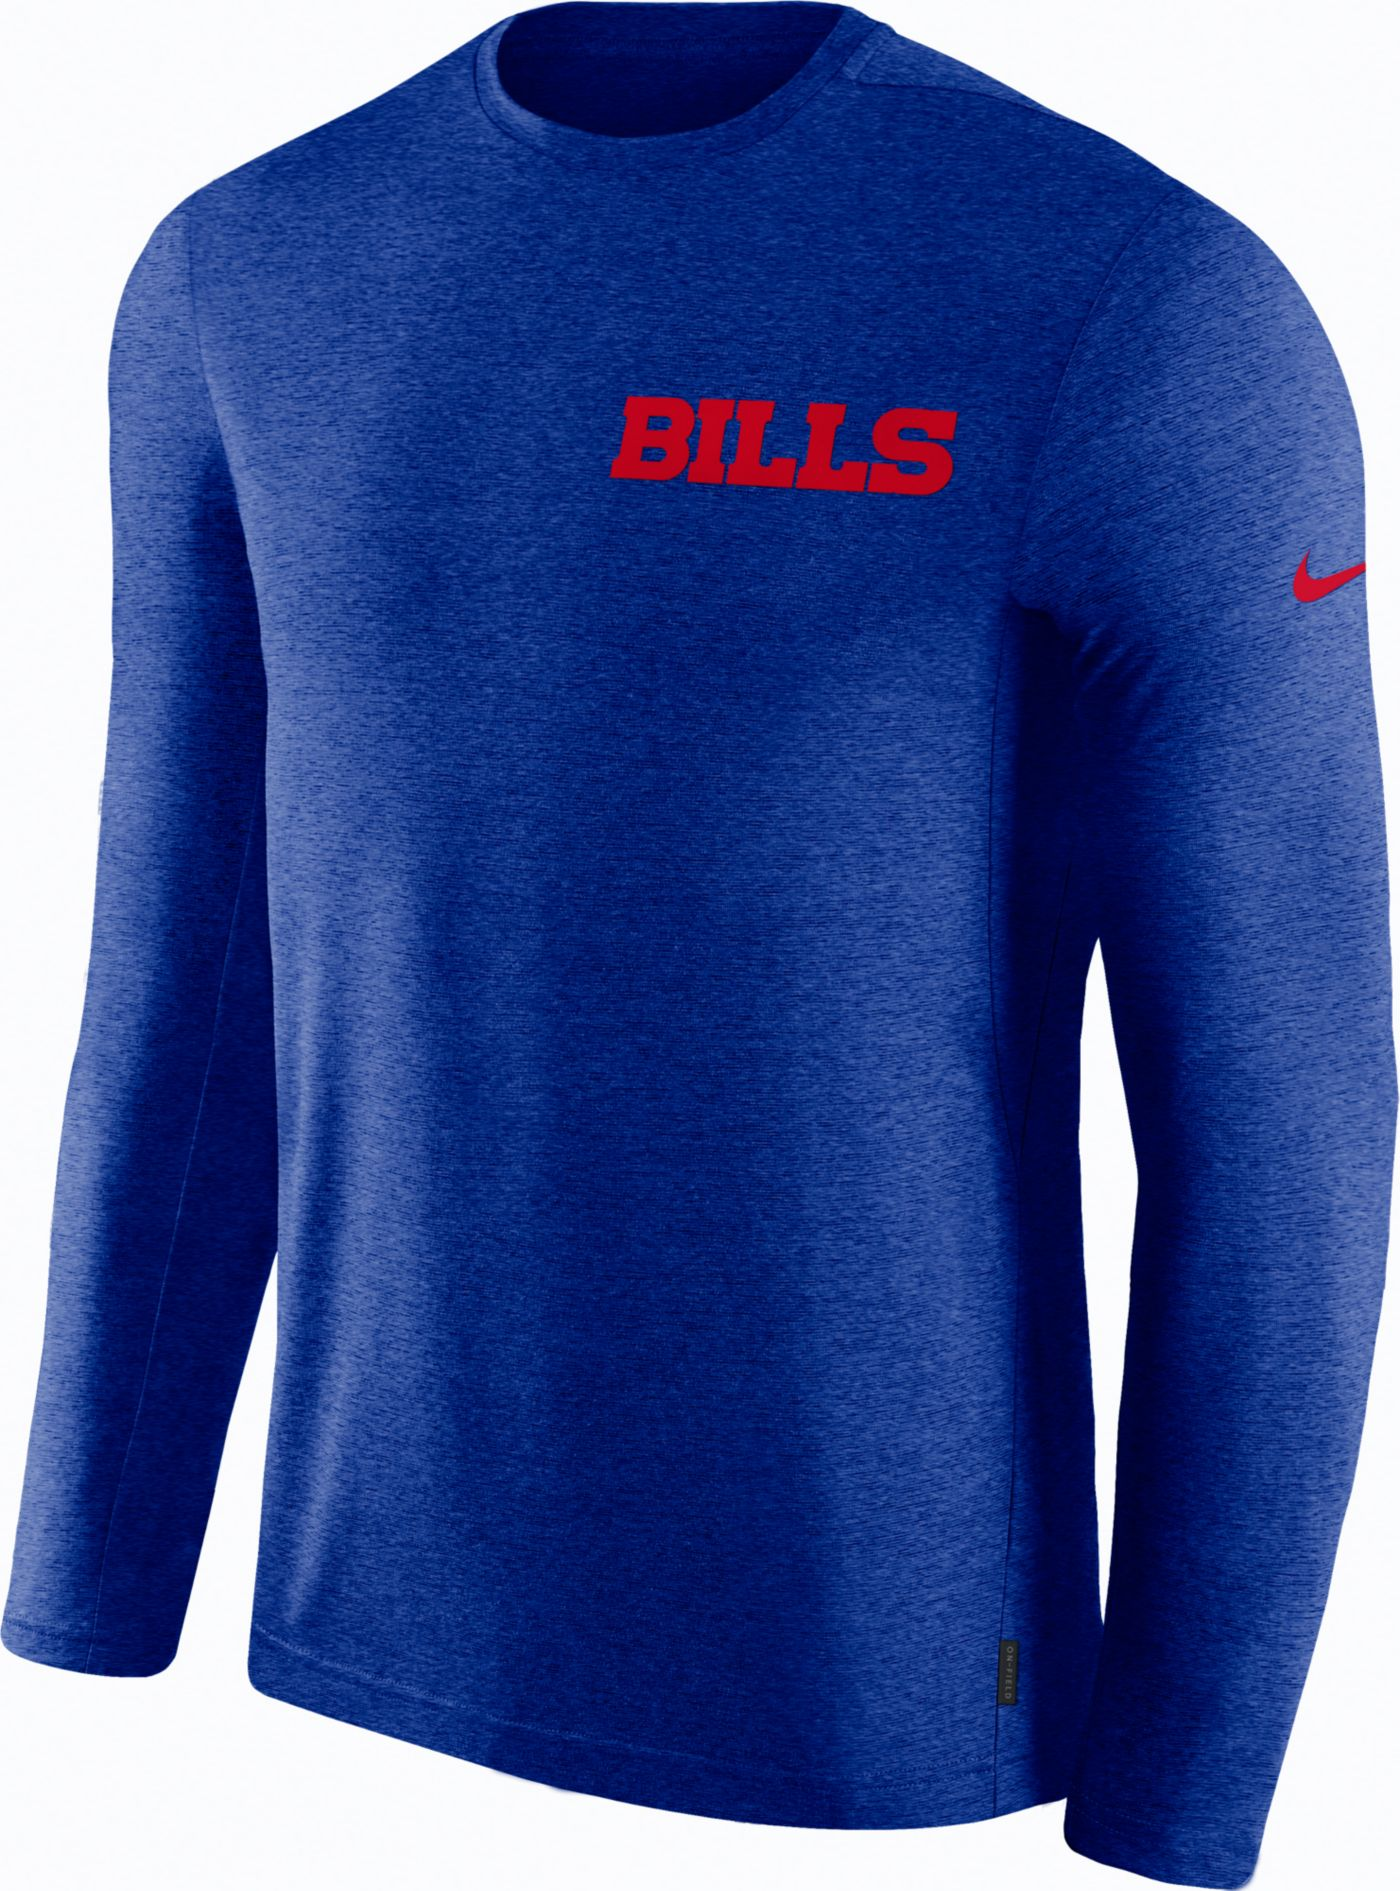 Nike Men's Buffalo Bills Sideline Coach Performance Royal Long Sleeve Shirt